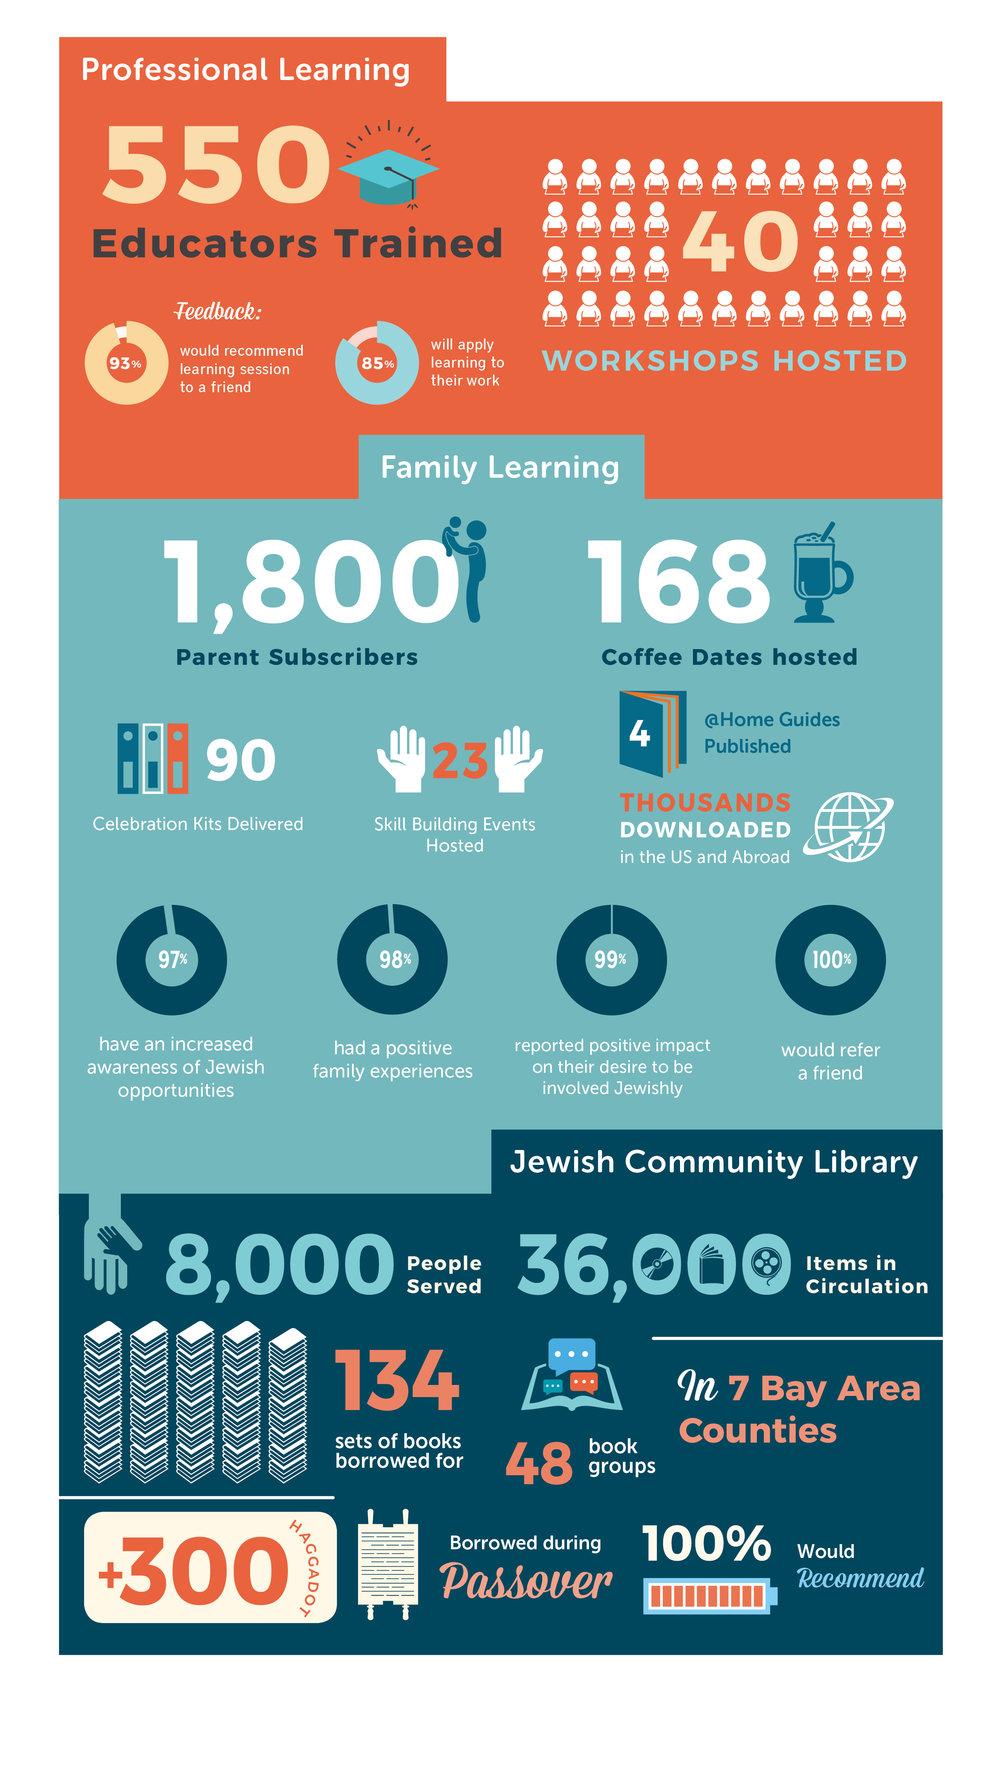 infographic_rgb-2.jpg